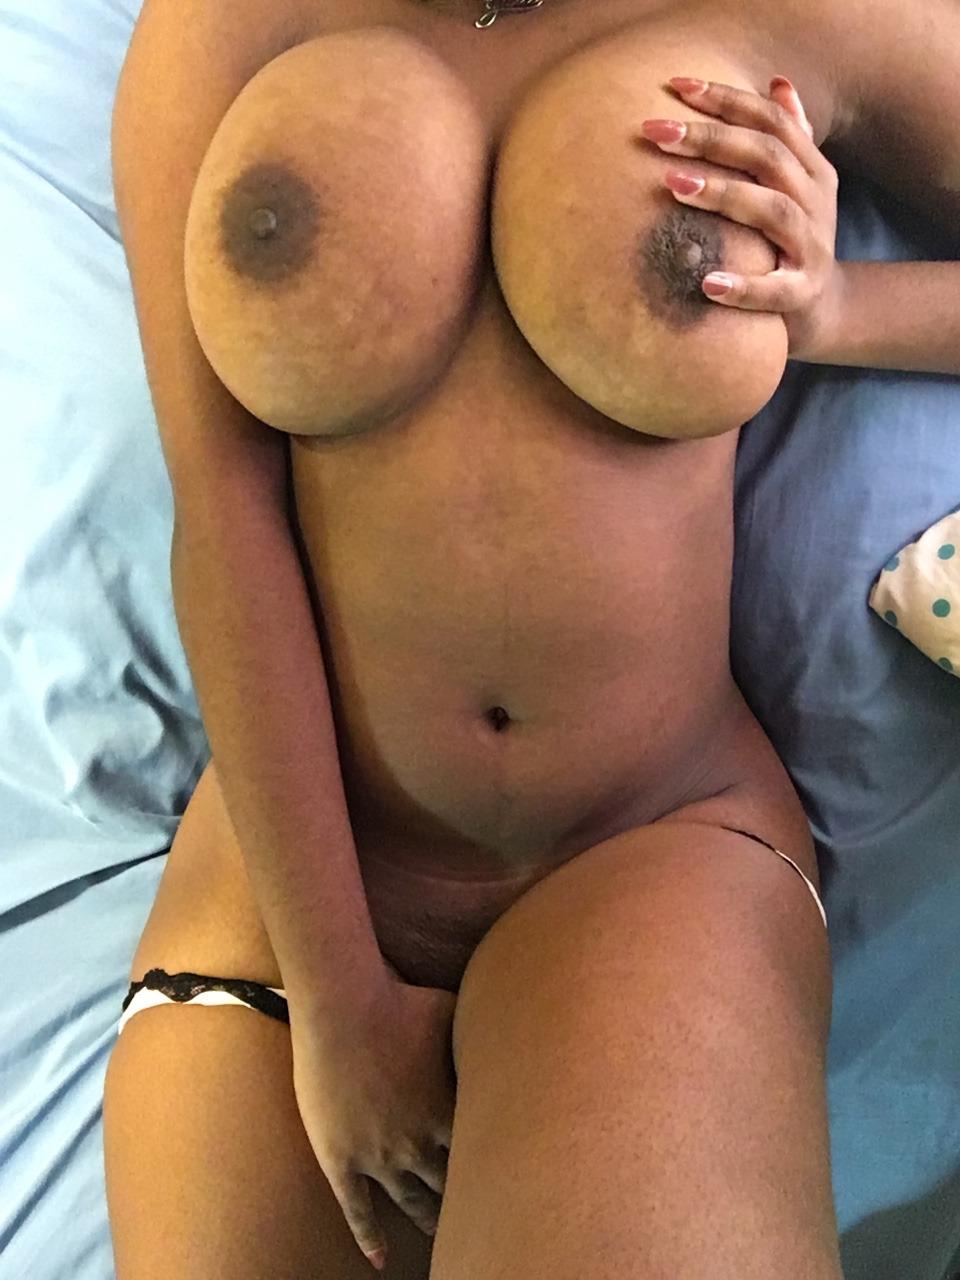 tumblr awesome boobs